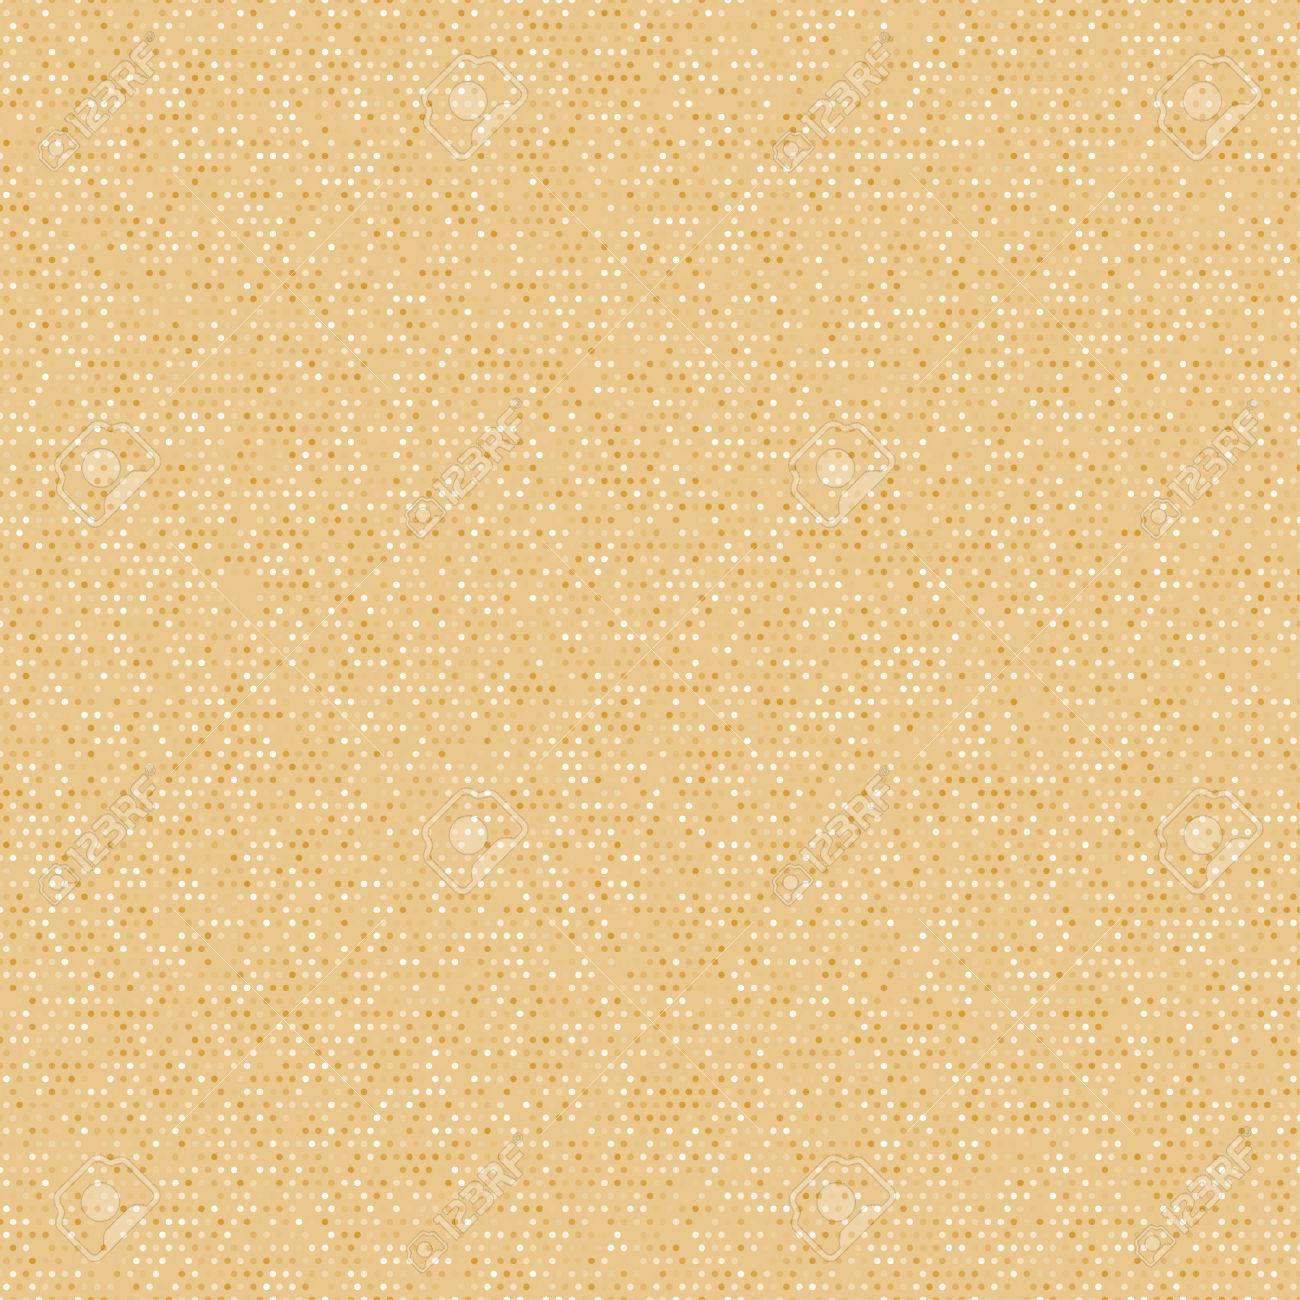 0f65c710dd52 Seamless stylized sand or cork pattern. Vintage polka dot paper. Digital  paper for scrapbook